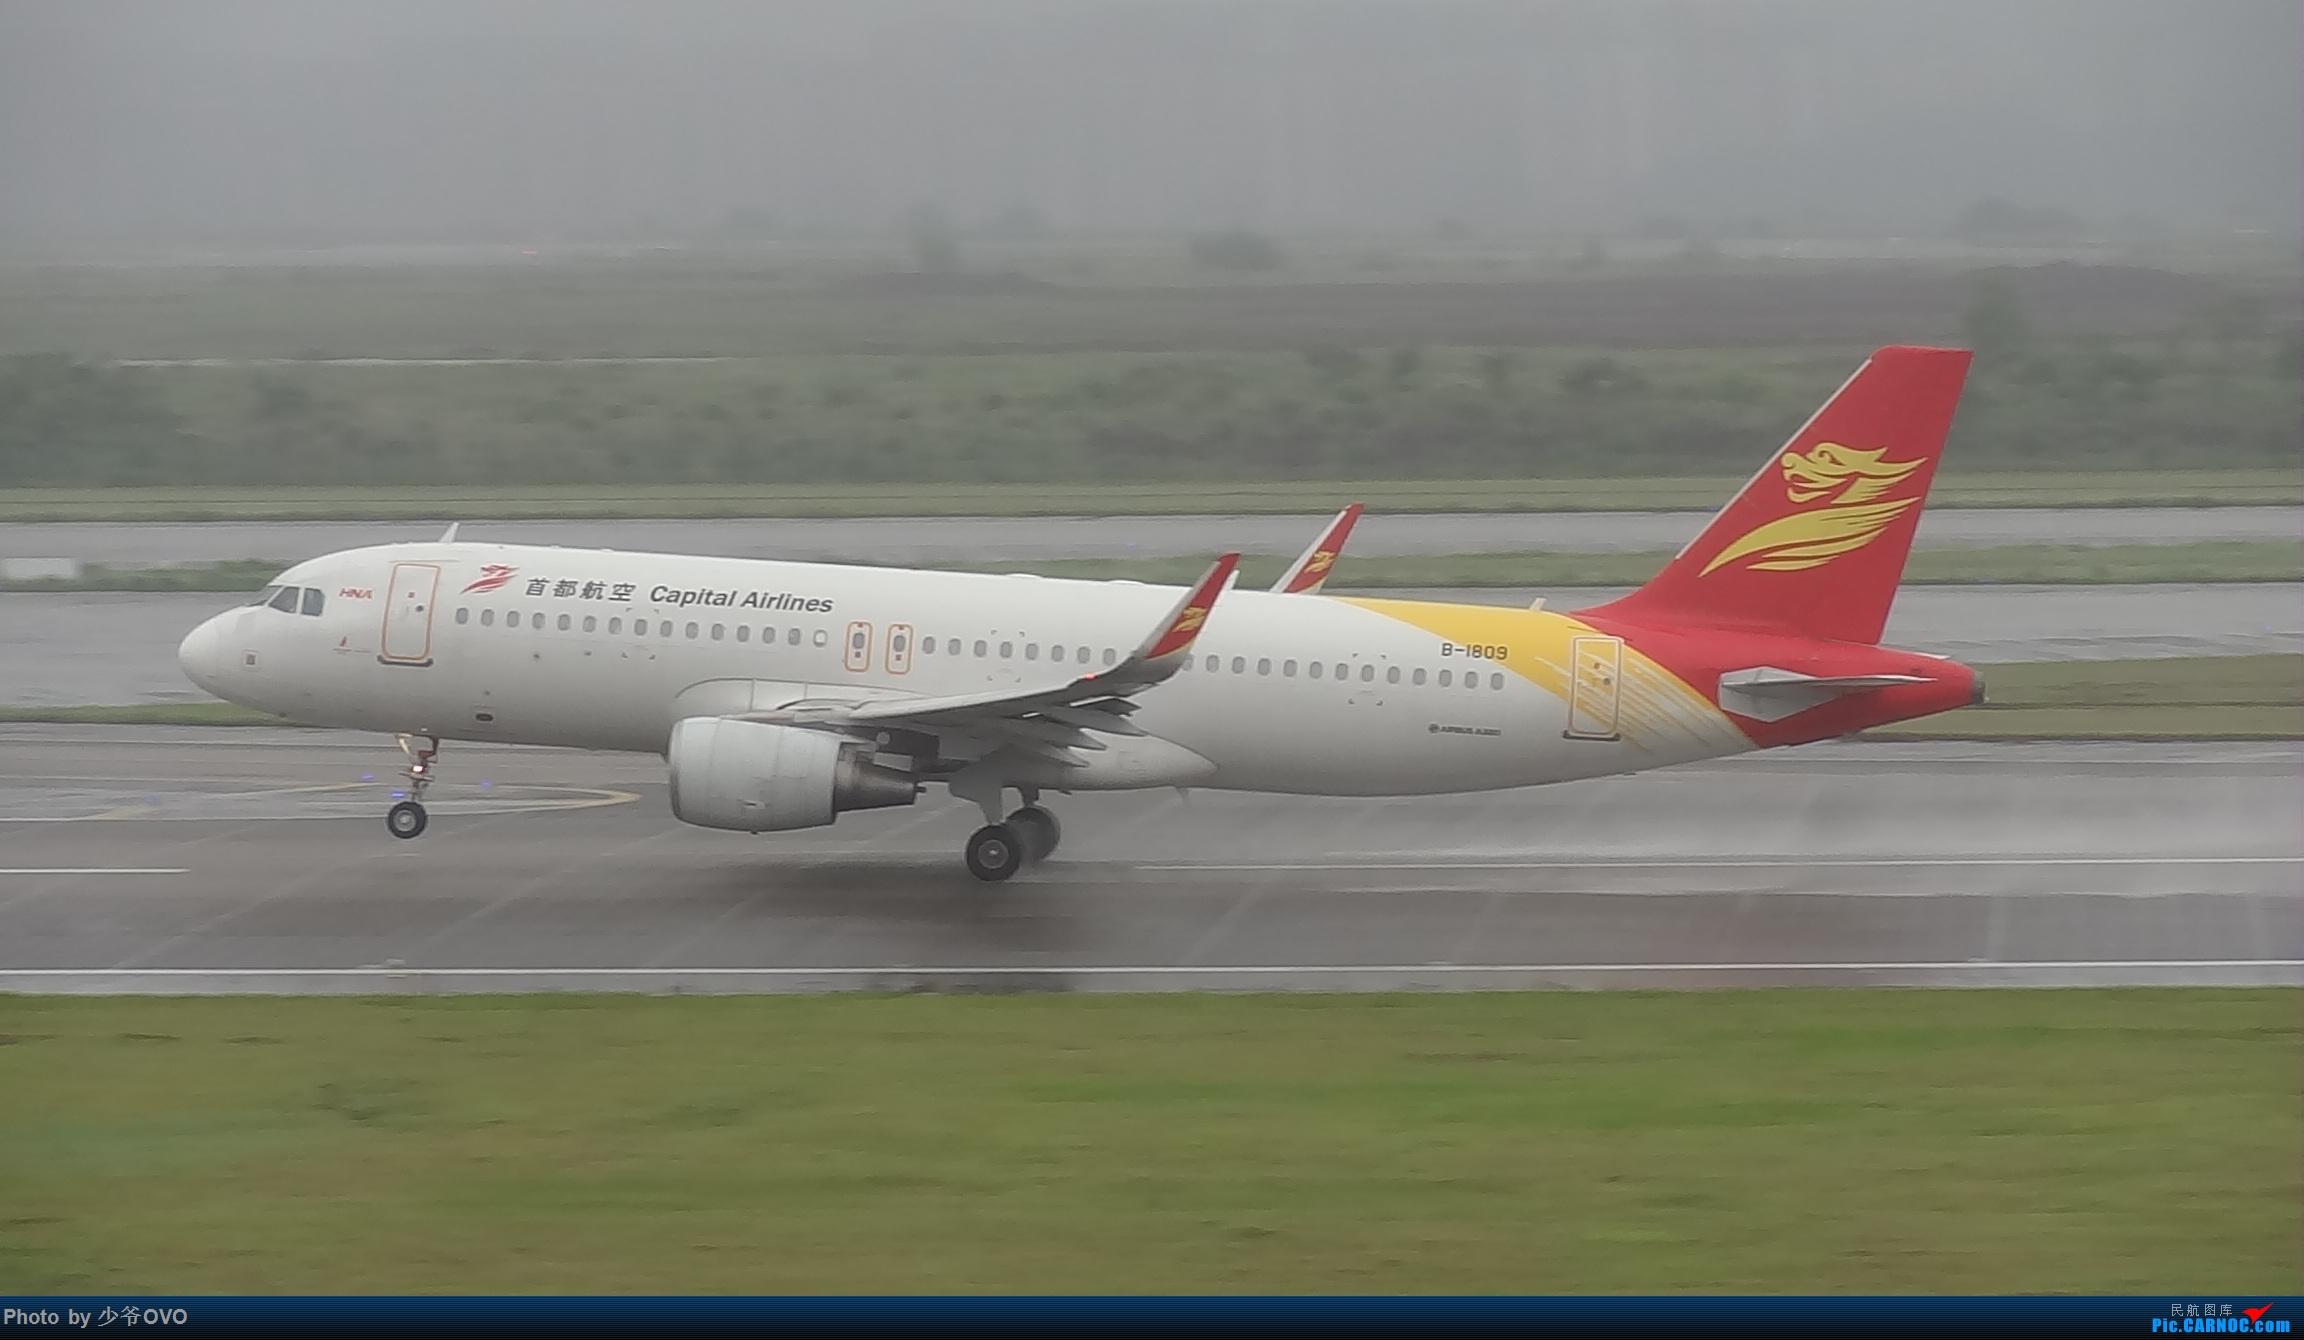 Re:[原创]CKG重庆江北机场拍机 ,中法建交50周年 AIRBUS A320-200 B-1809 中国重庆江北国际机场